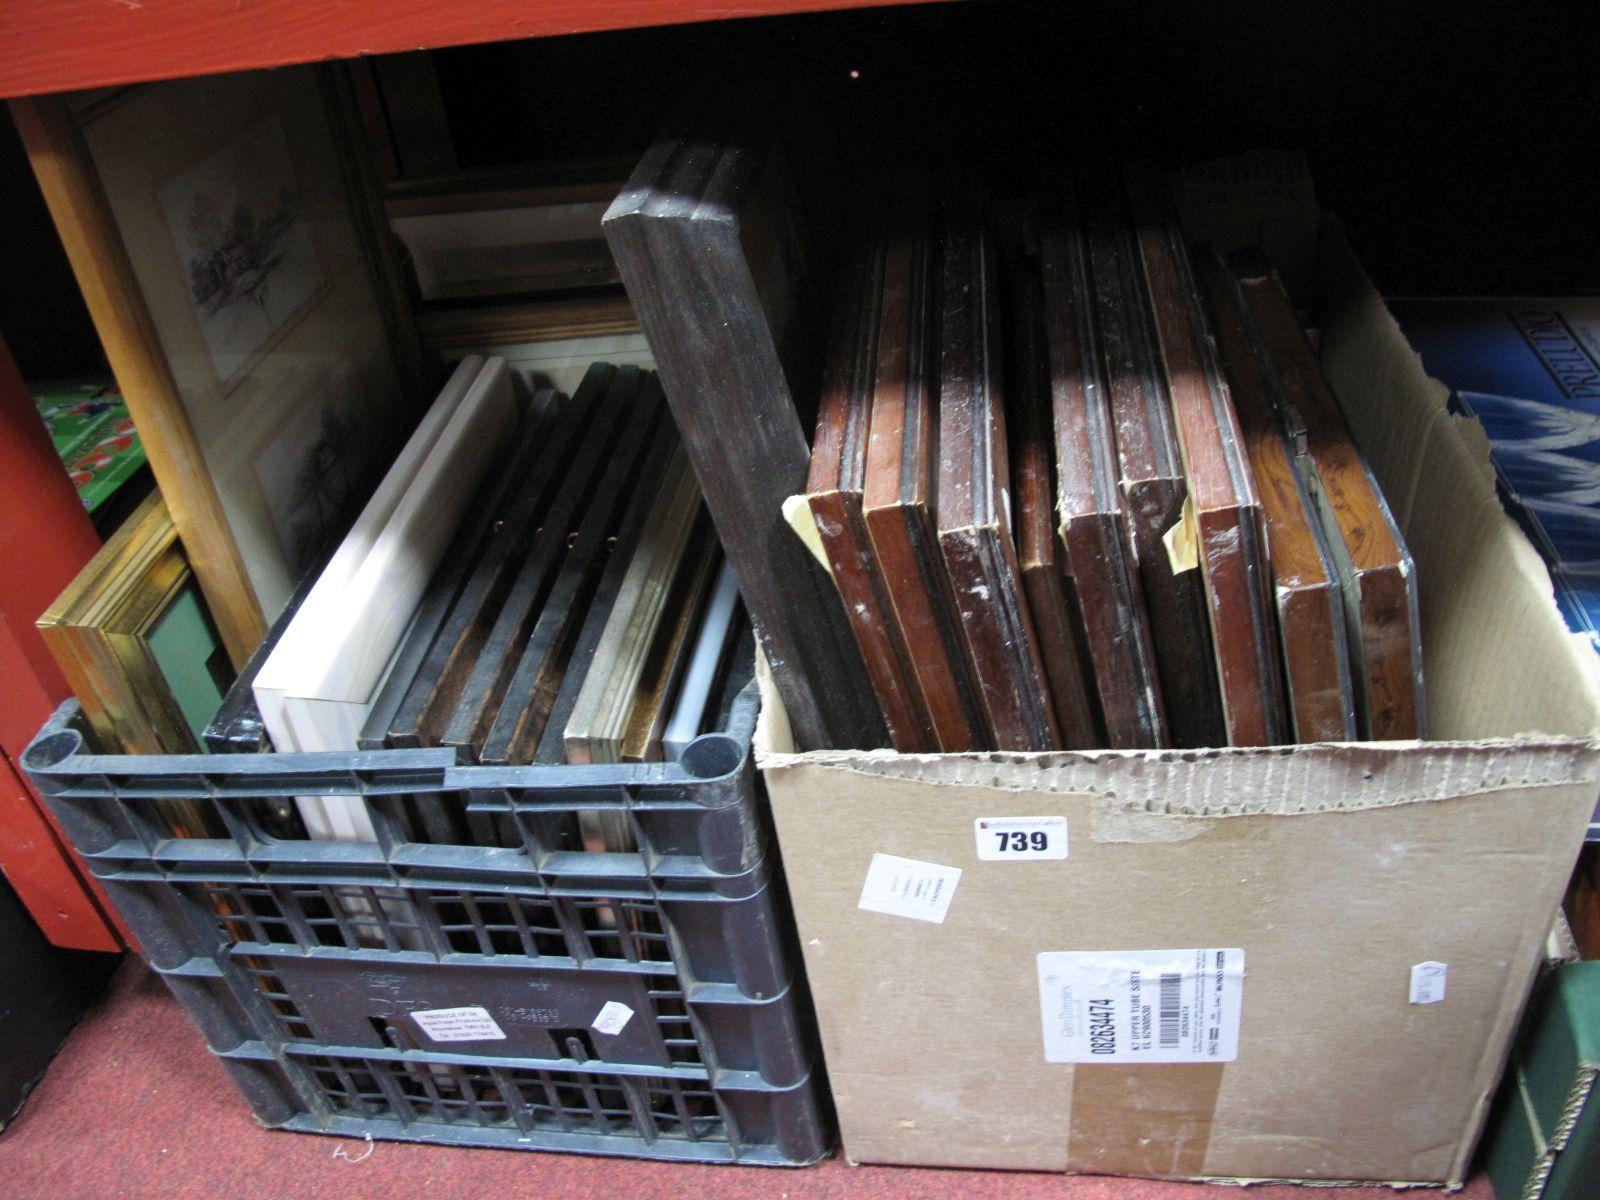 Lot 739 - Quantity of Prints, frames etc:- Two Boxes